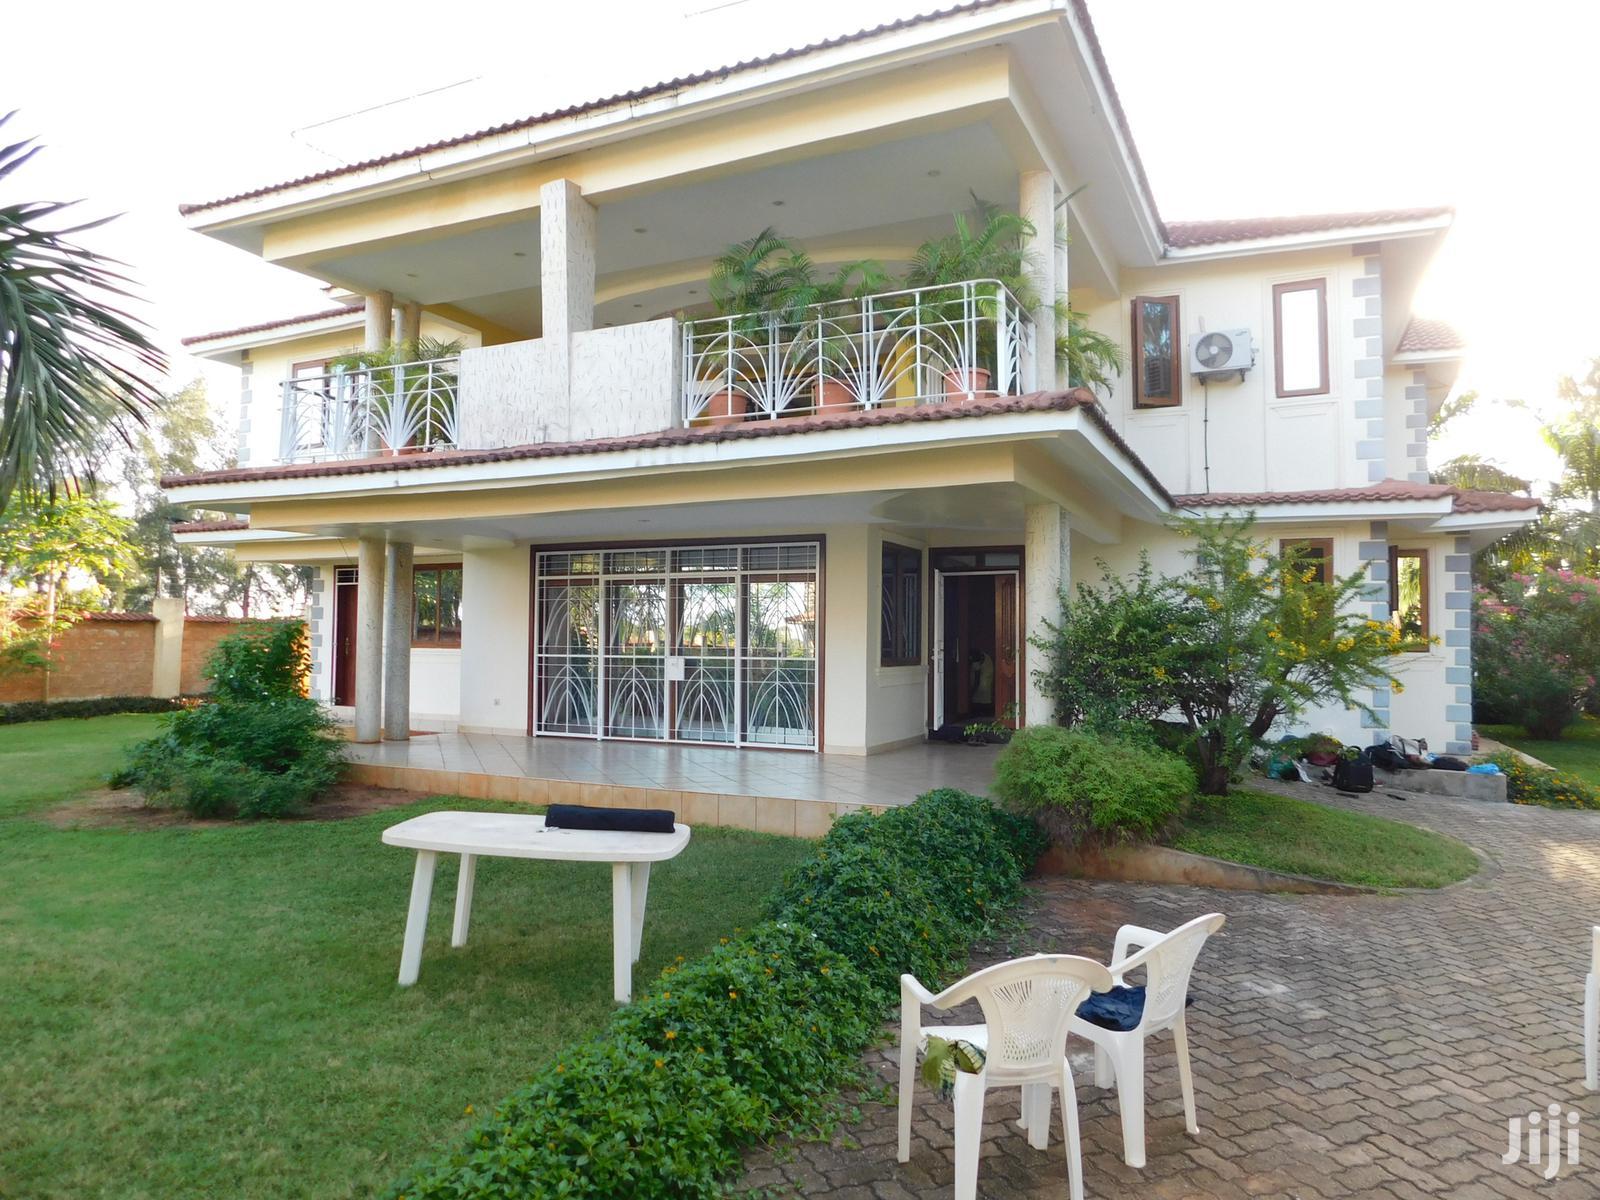 4 Bedroom Spacious House On Sale Vipingo, Benford Homes